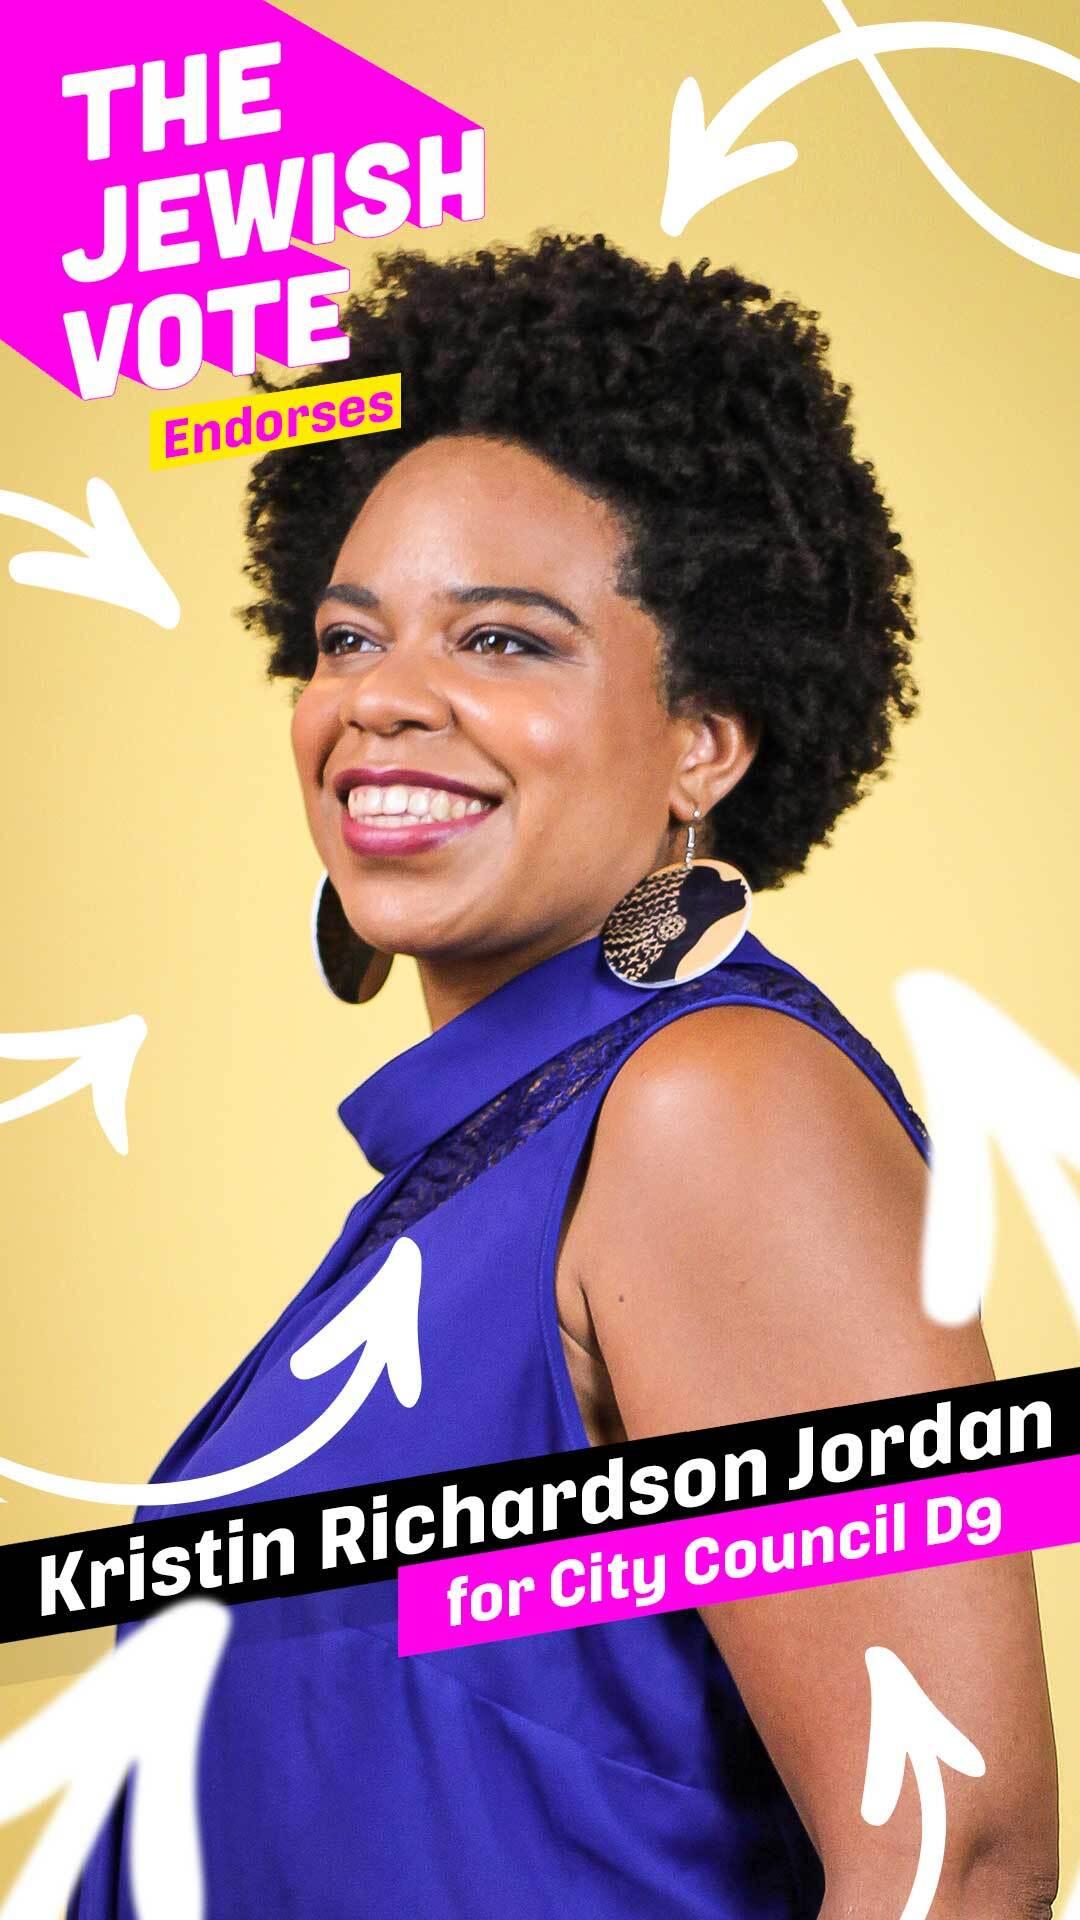 Kristin Richardson Jordan